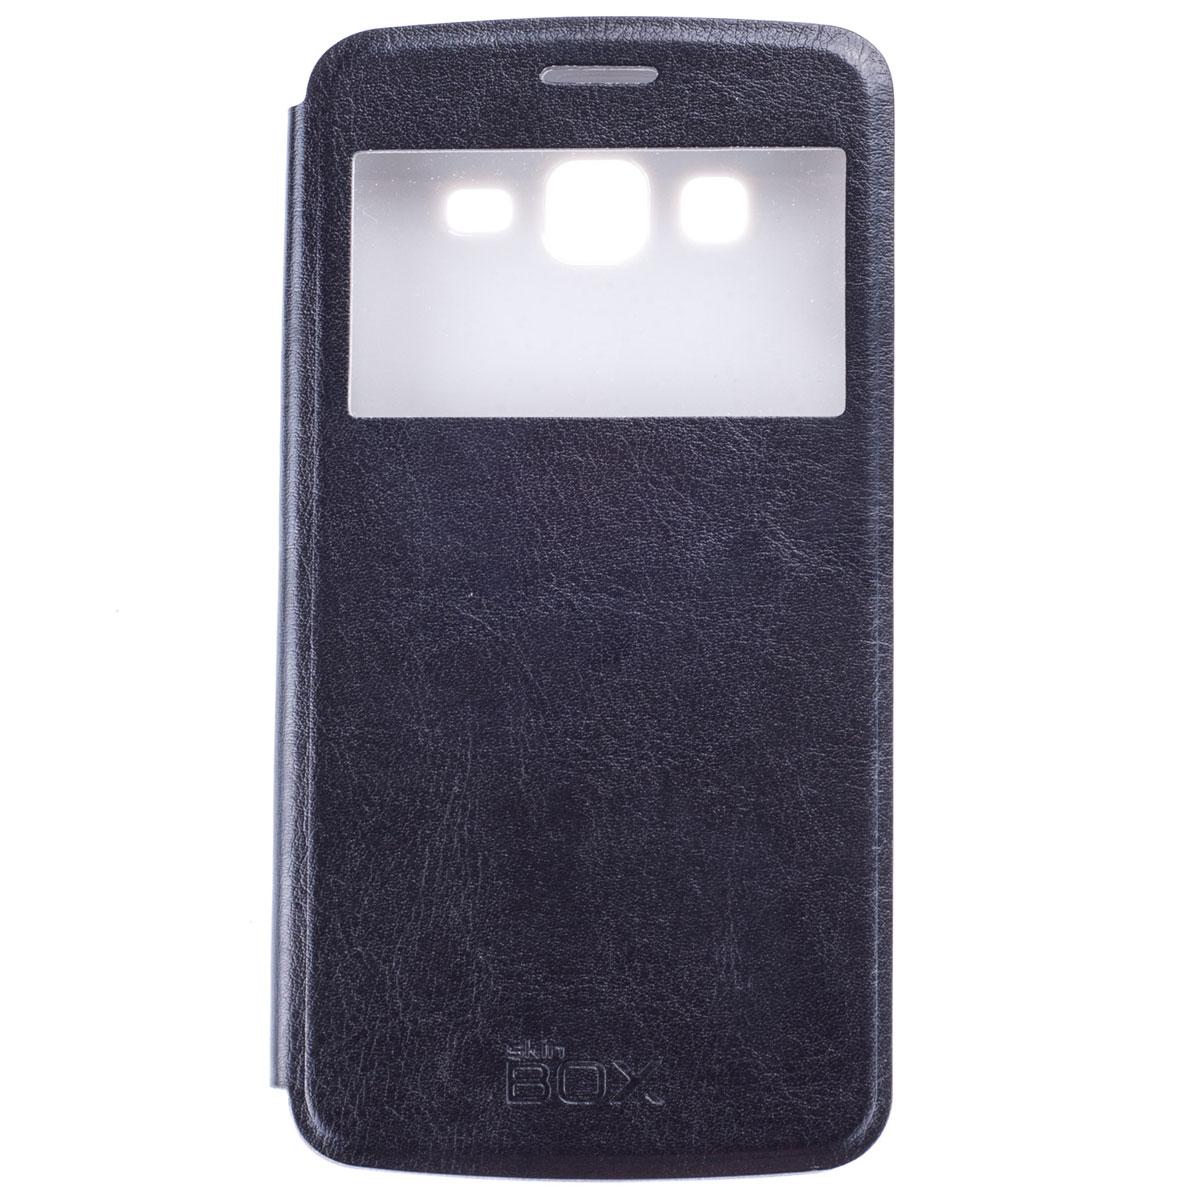 Skinbox Lux AW чехол для Samsung Galaxy Grand 2 Duos, Black skinbox lux aw чехол для samsung galaxy a7 yellow